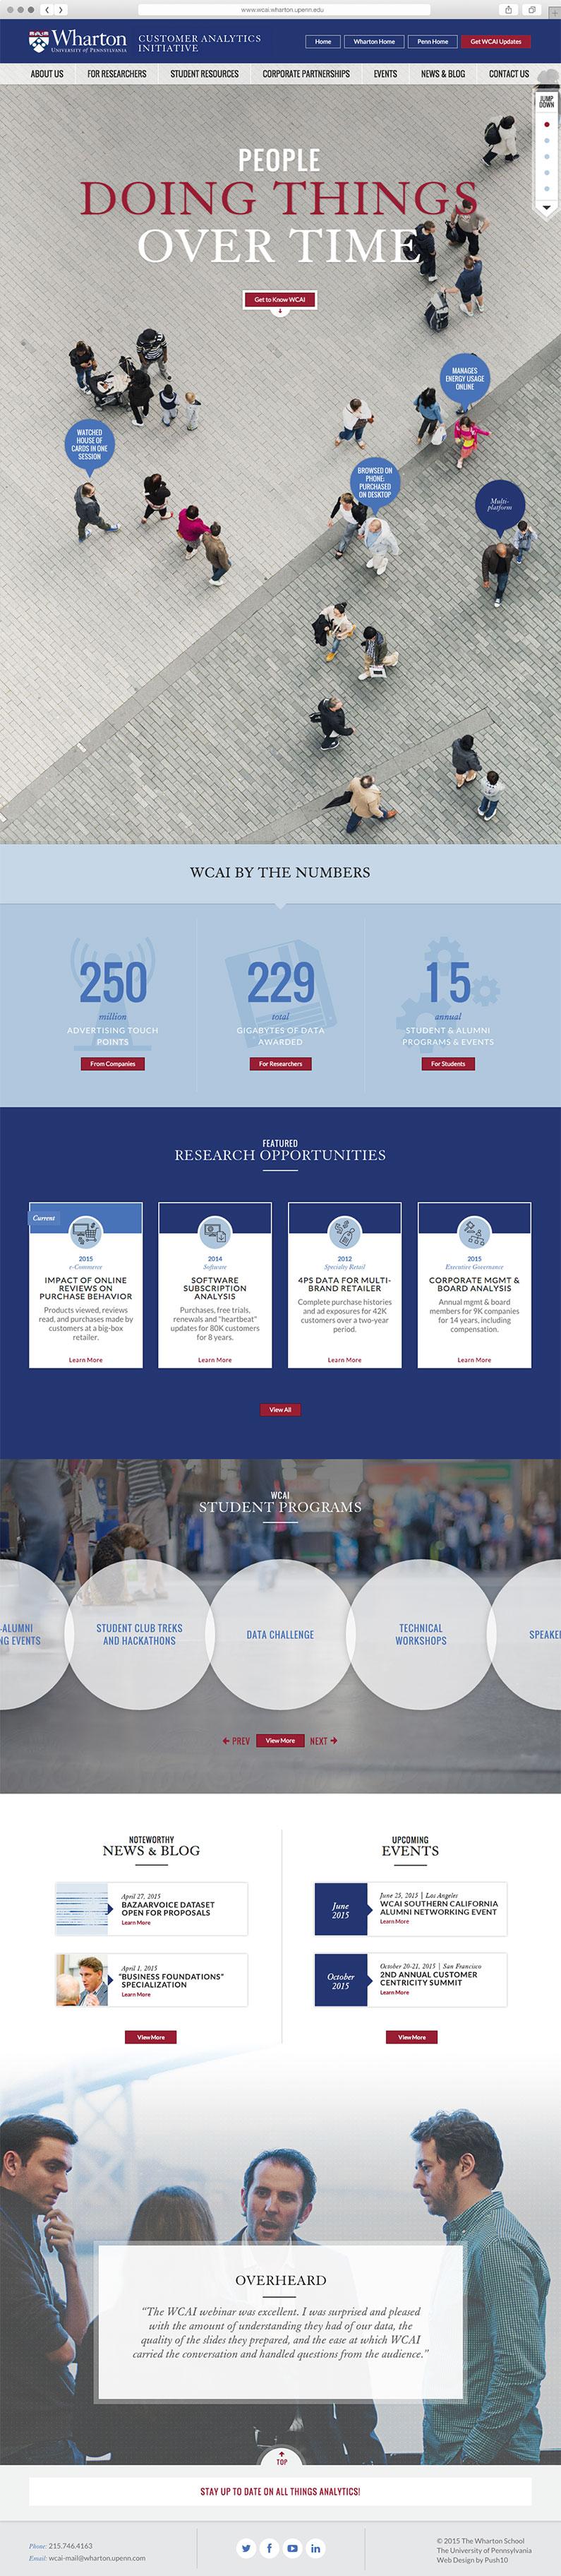 Wharton Customer Analytics Initiative, Wharton, Web design, website design philadelphia, push10, responsive web design